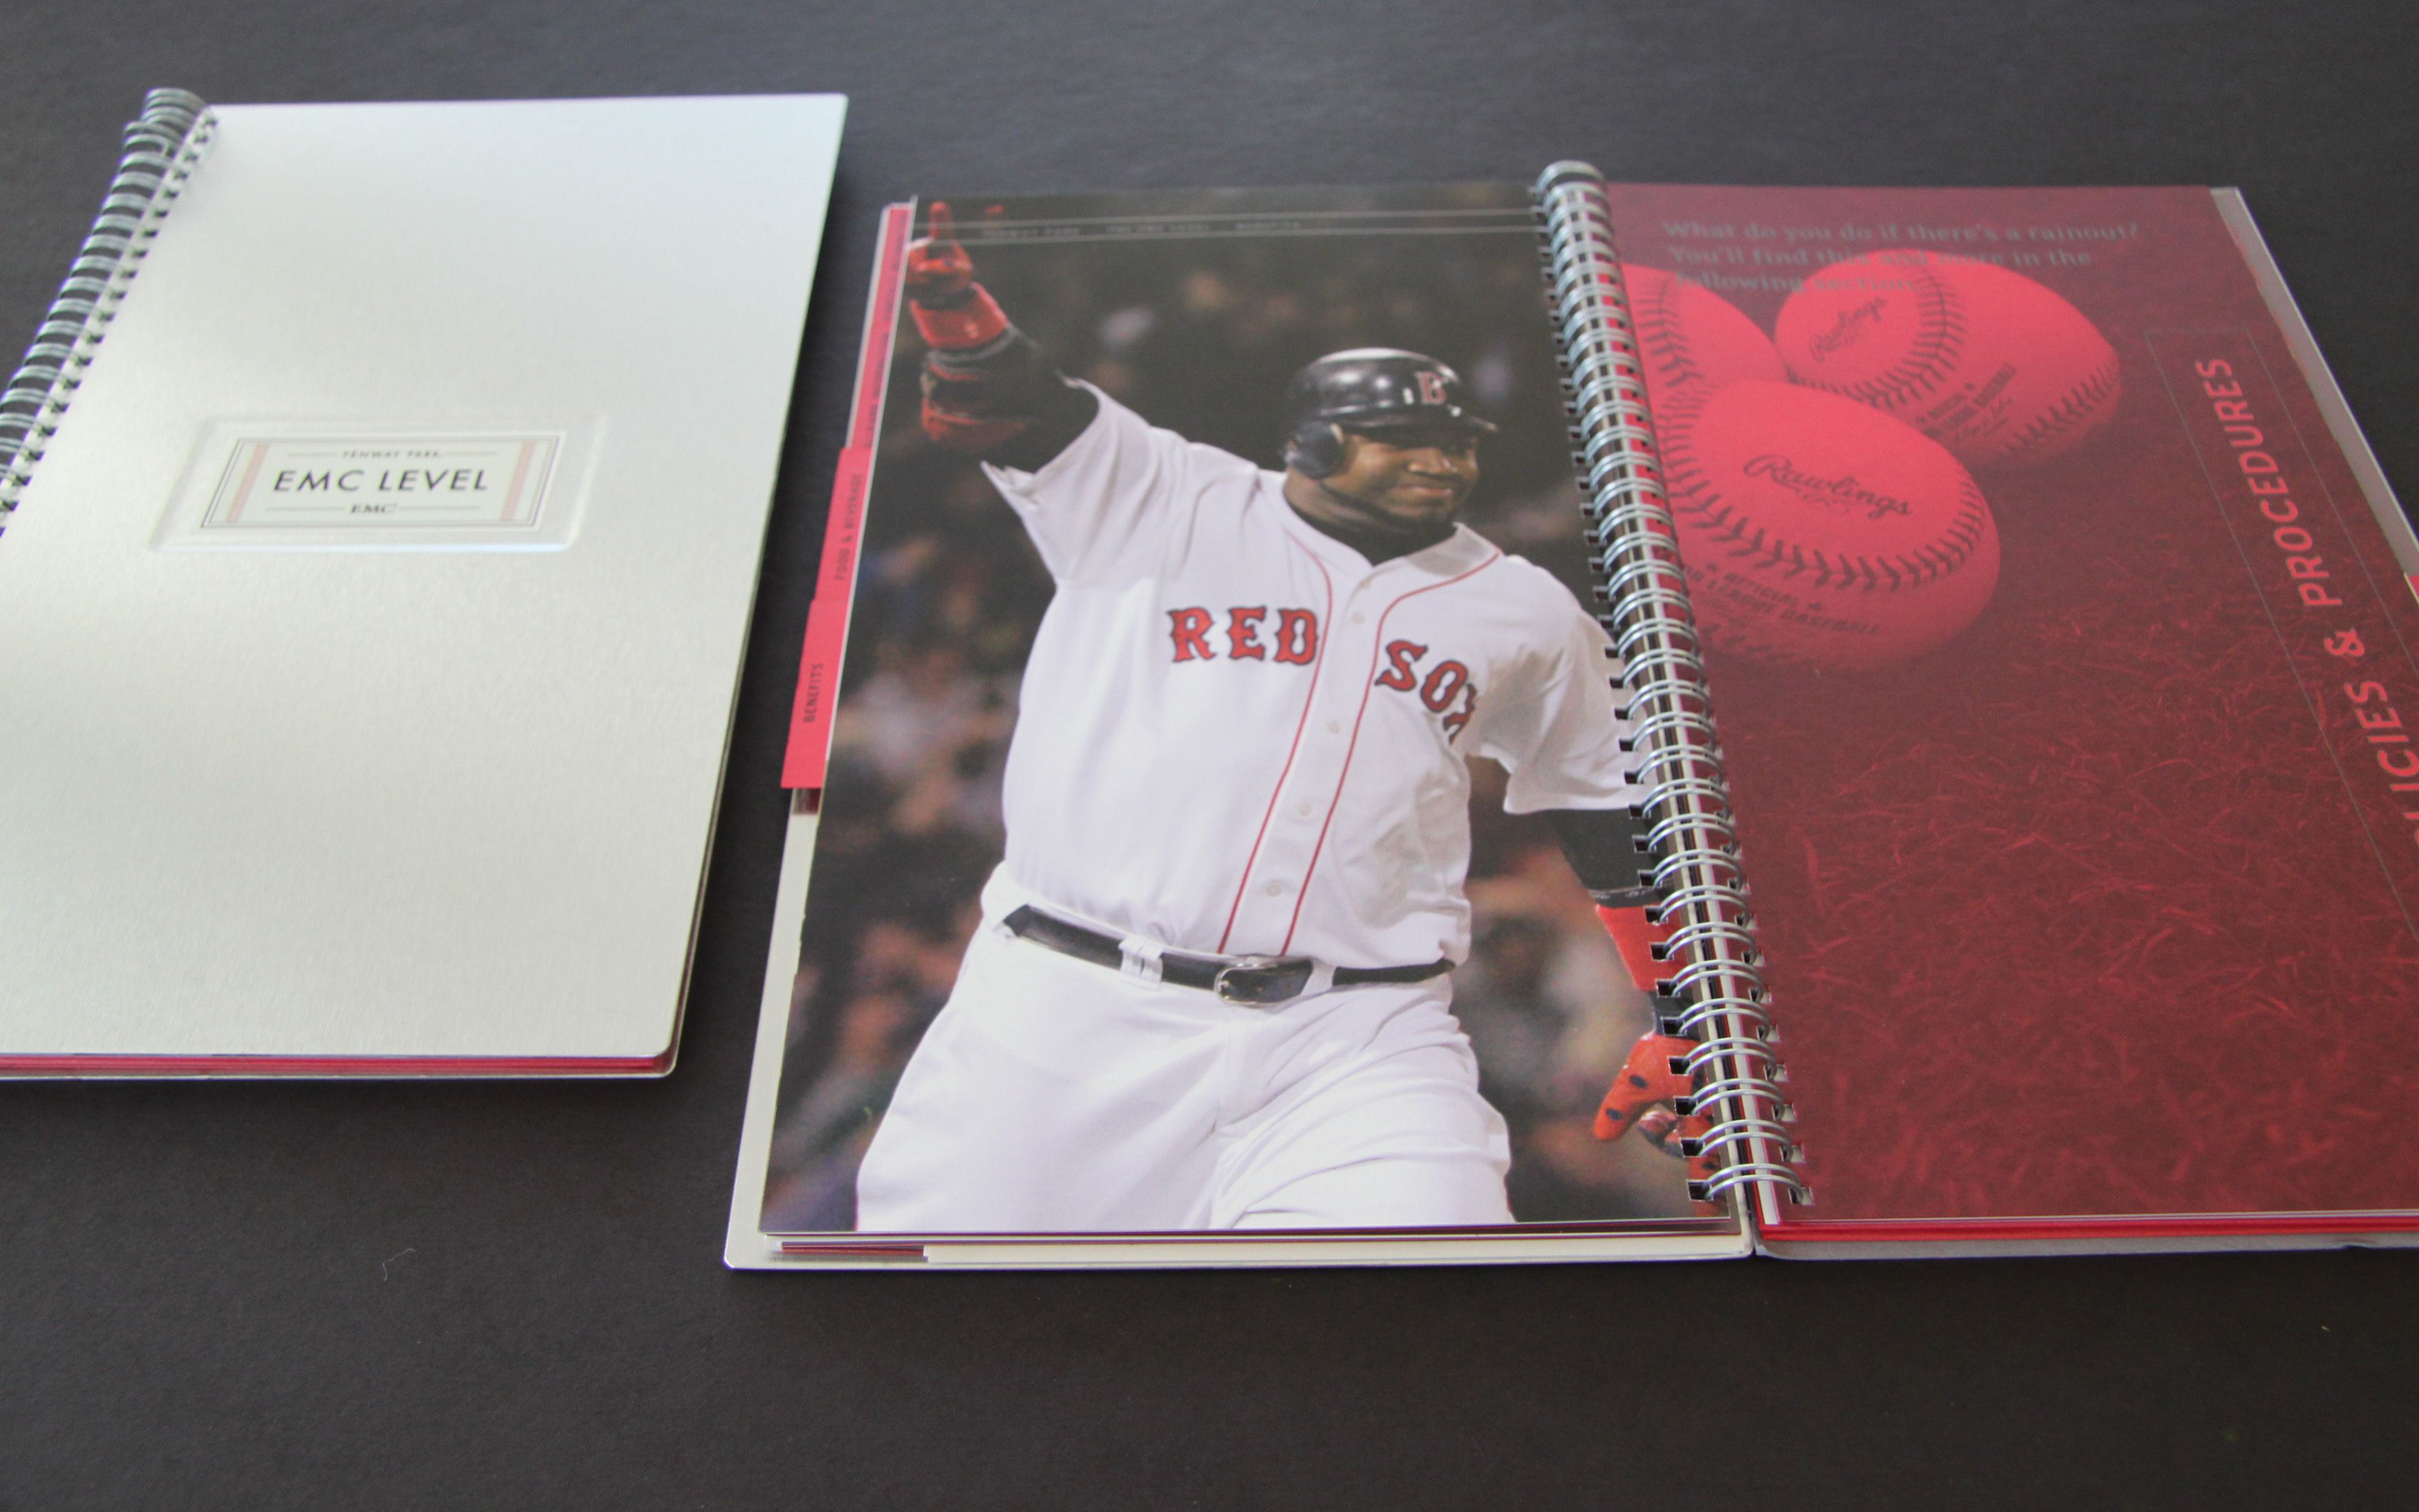 Boston Red Sox EMC Club Information Manual